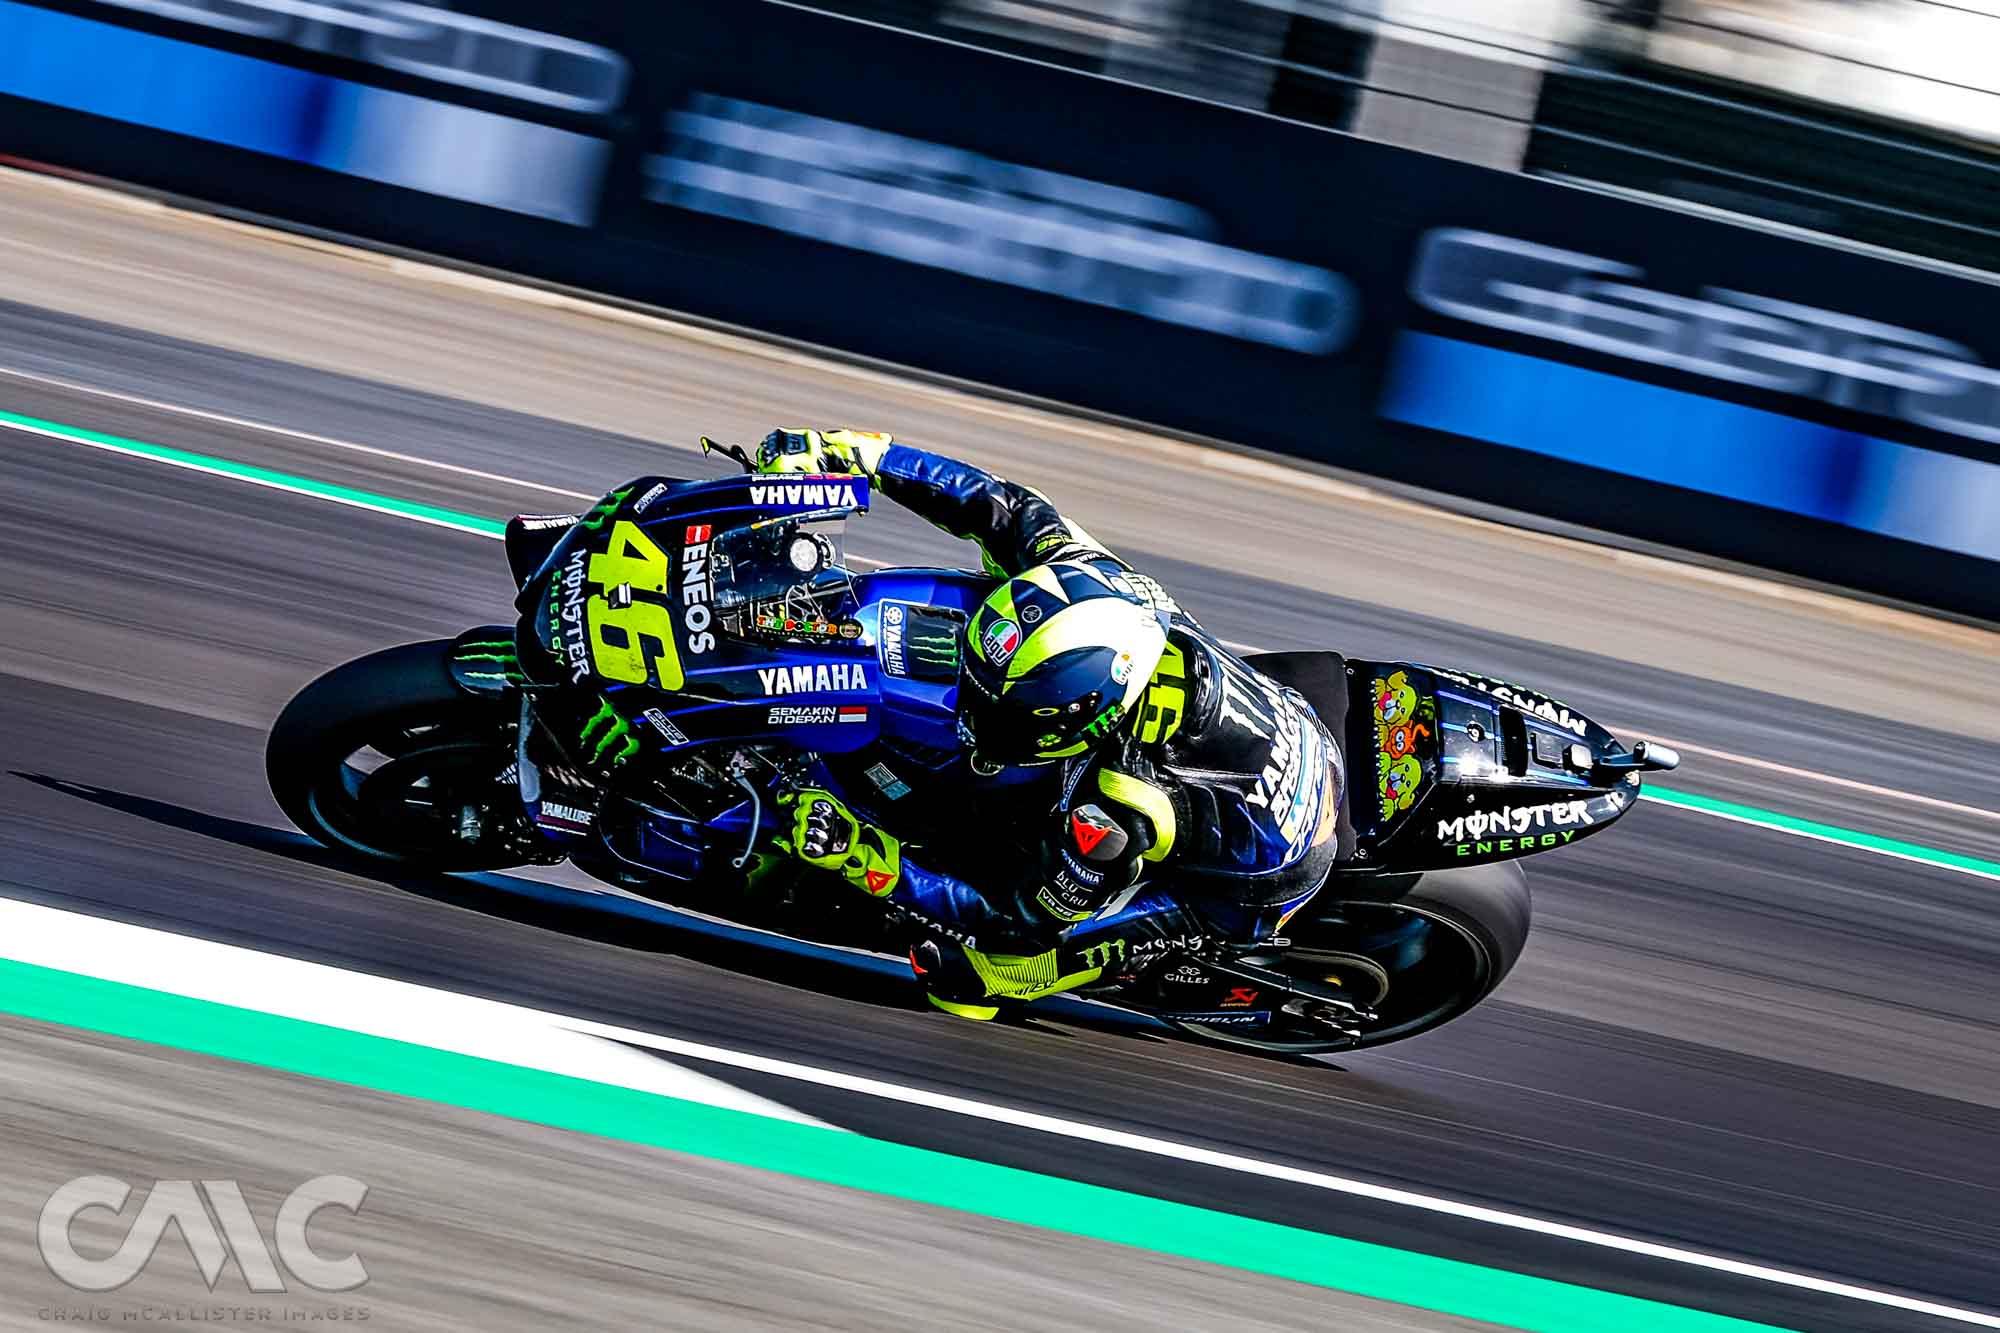 CMC_MotoGP_FP3_Silverstone 50-1404184.jpg